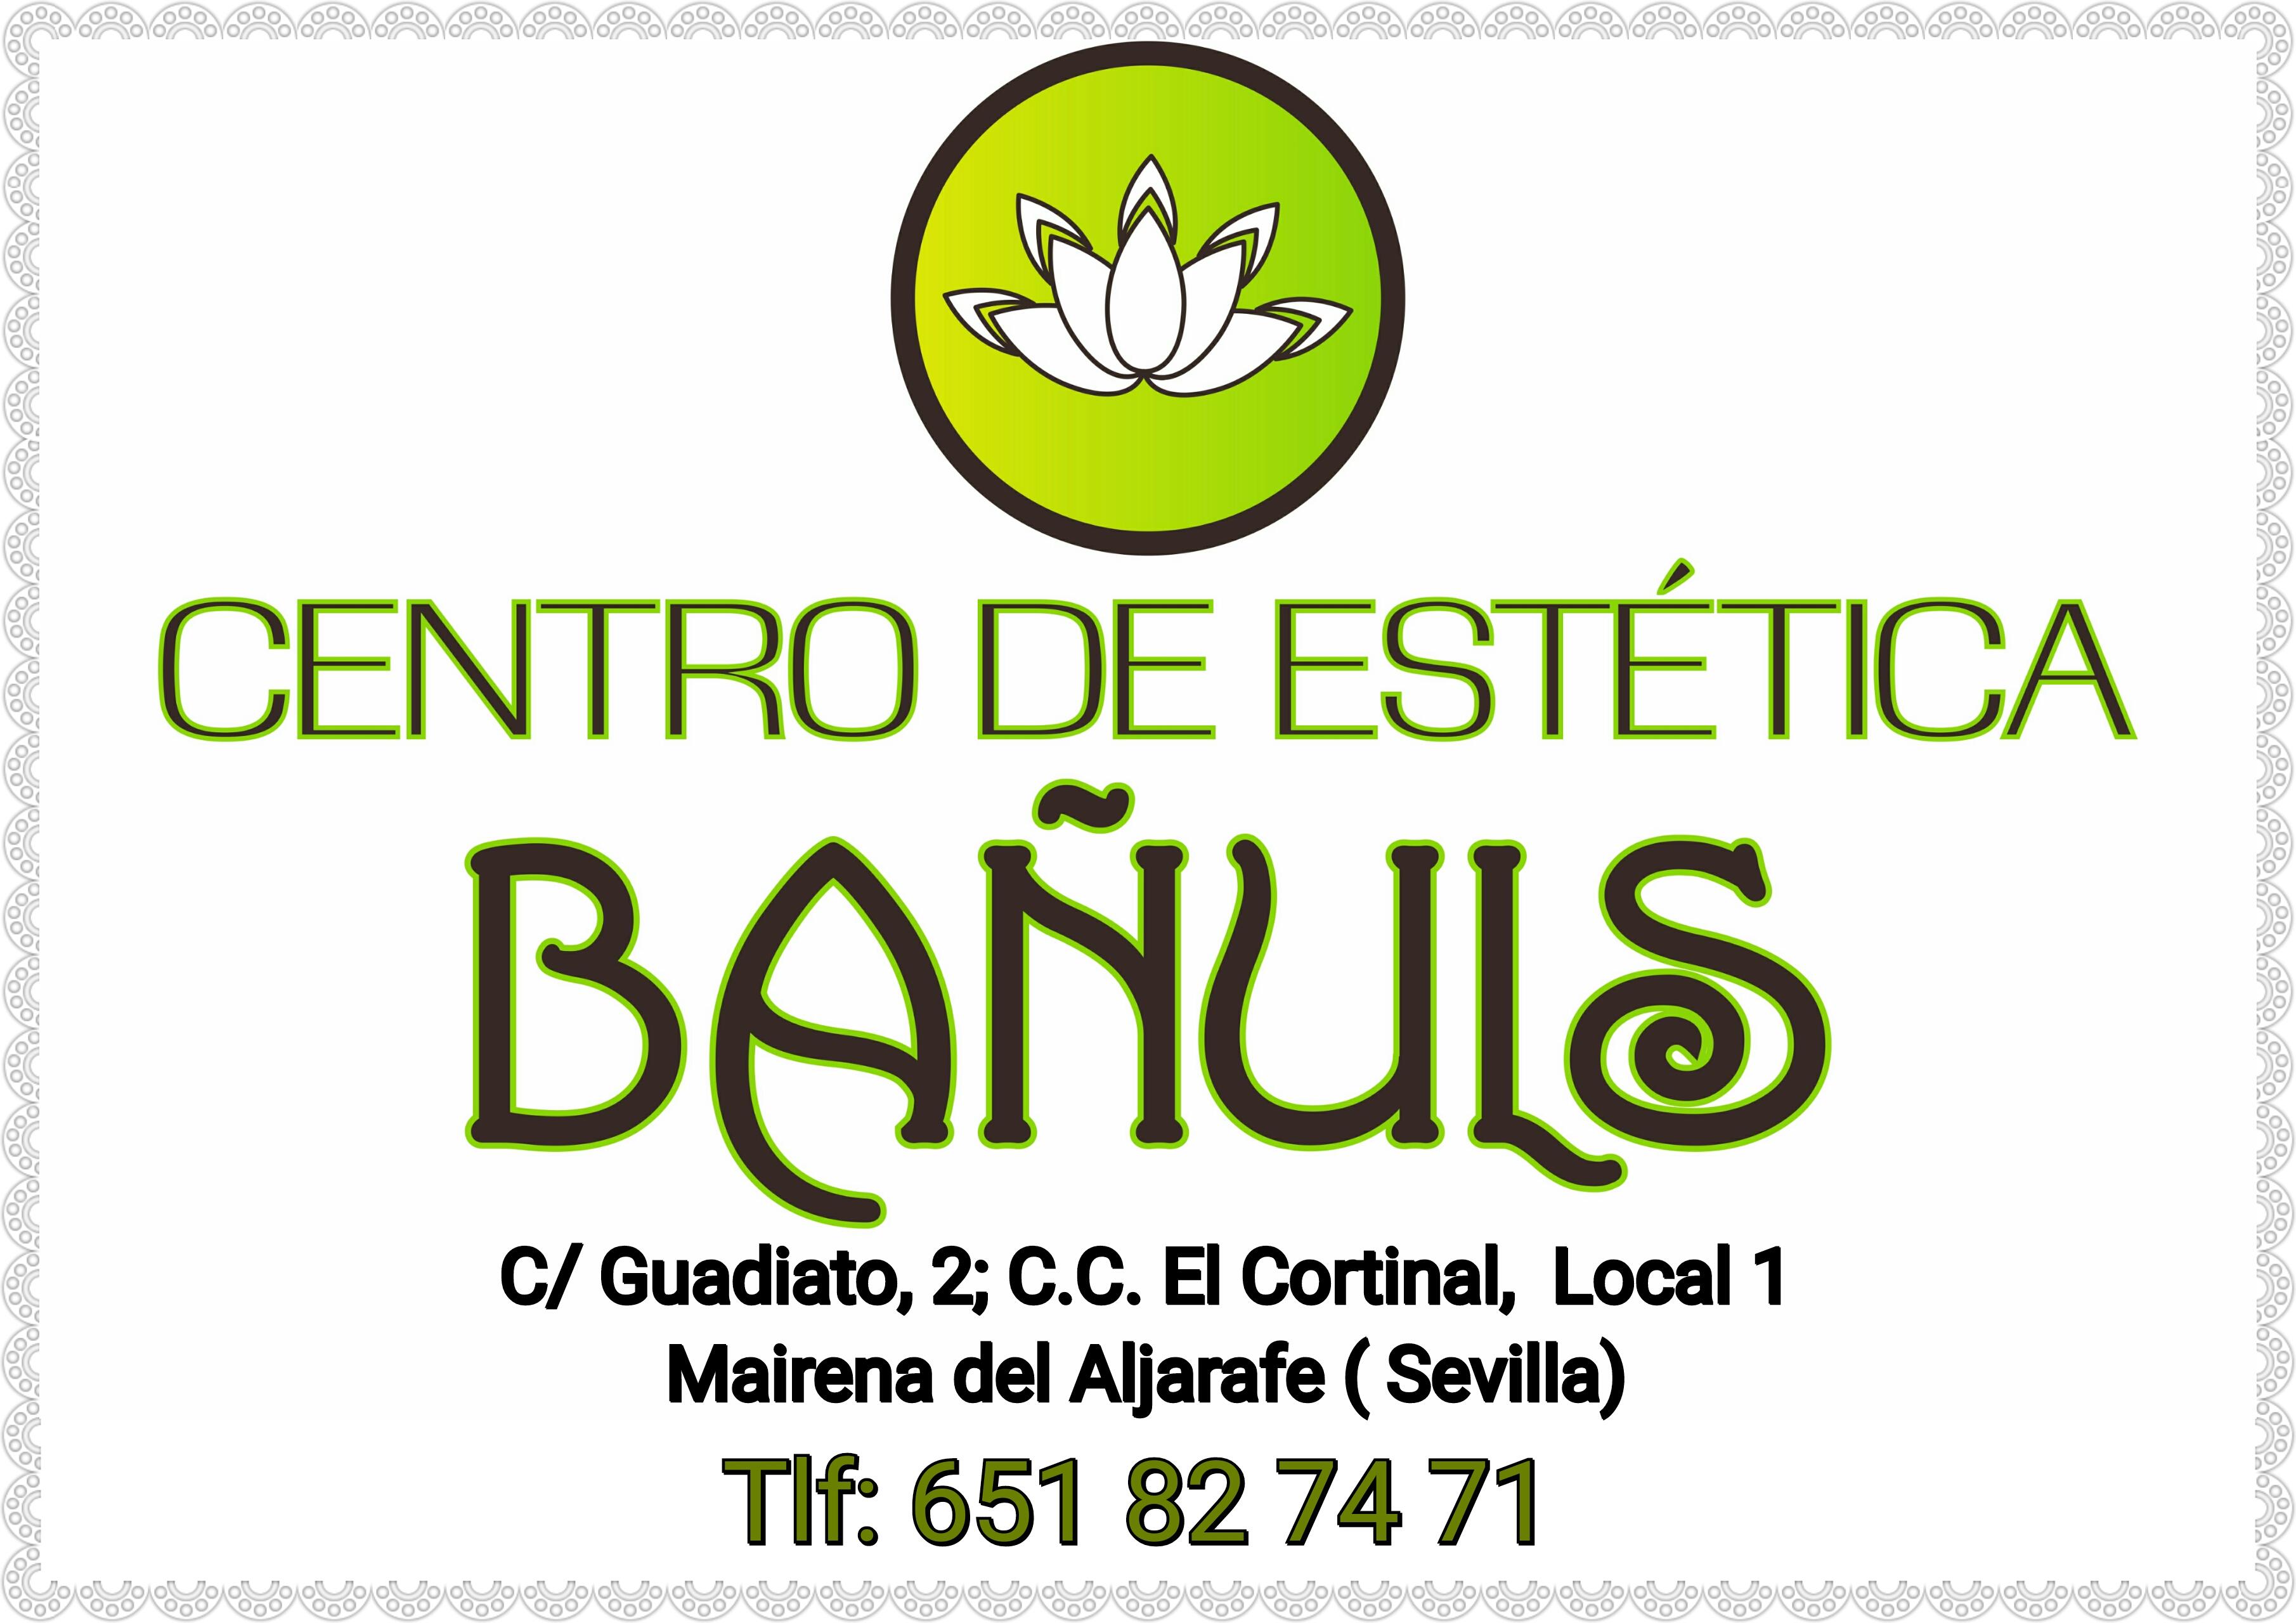 Centro De Estética Bañuls